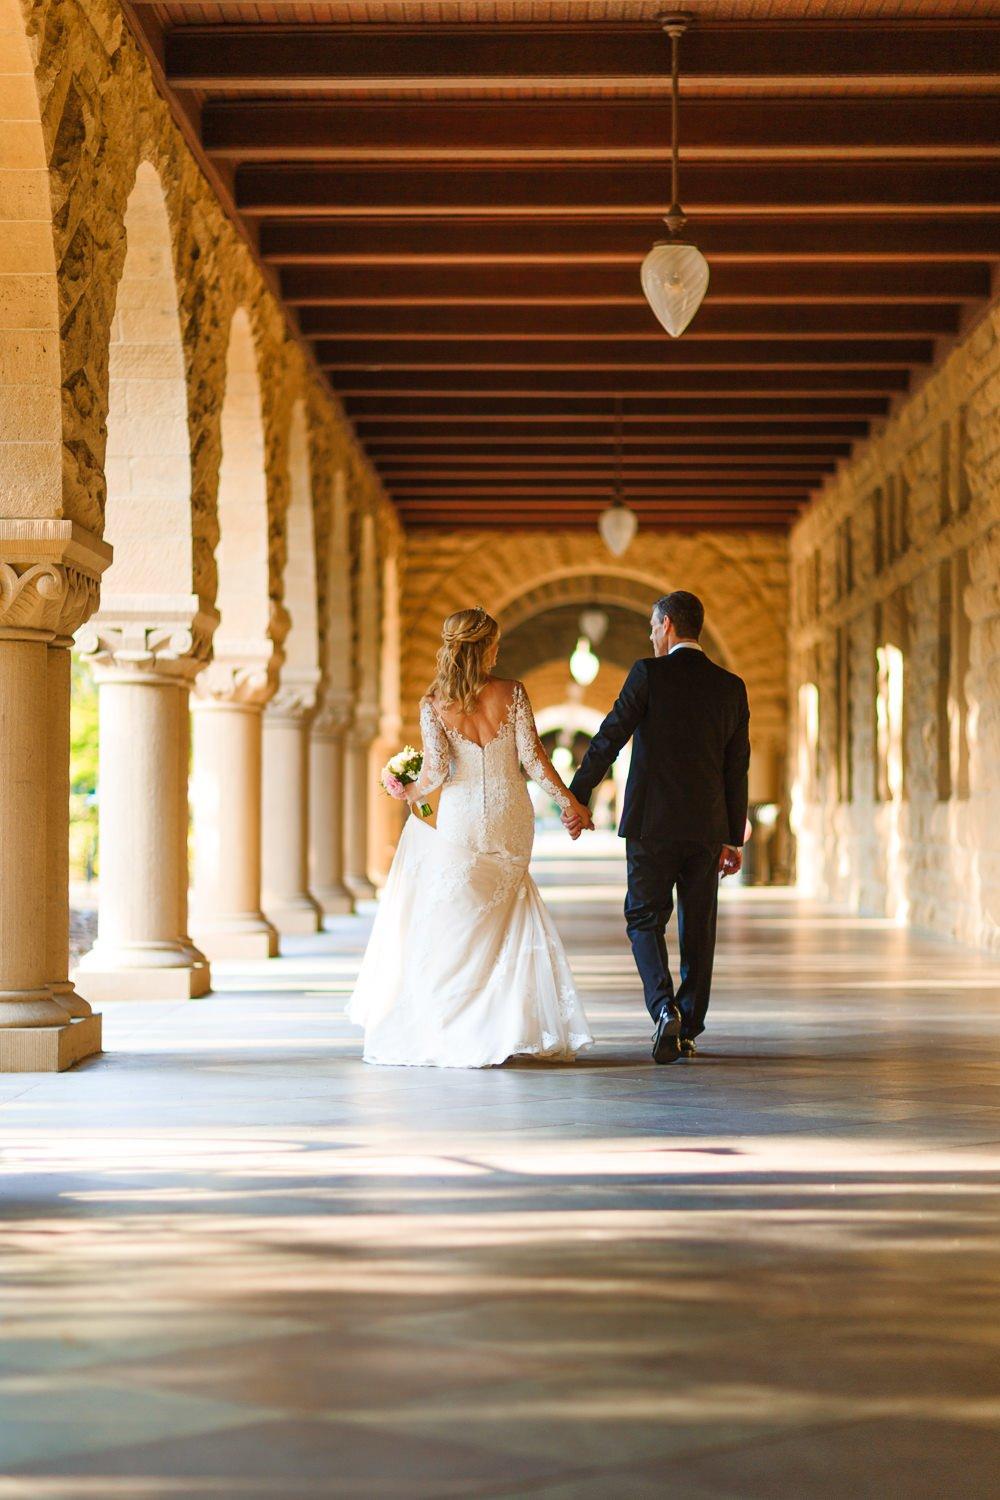 stanford-university-wedding-romantic-portraits-arpit-mehta-san-francisco-photographer-27